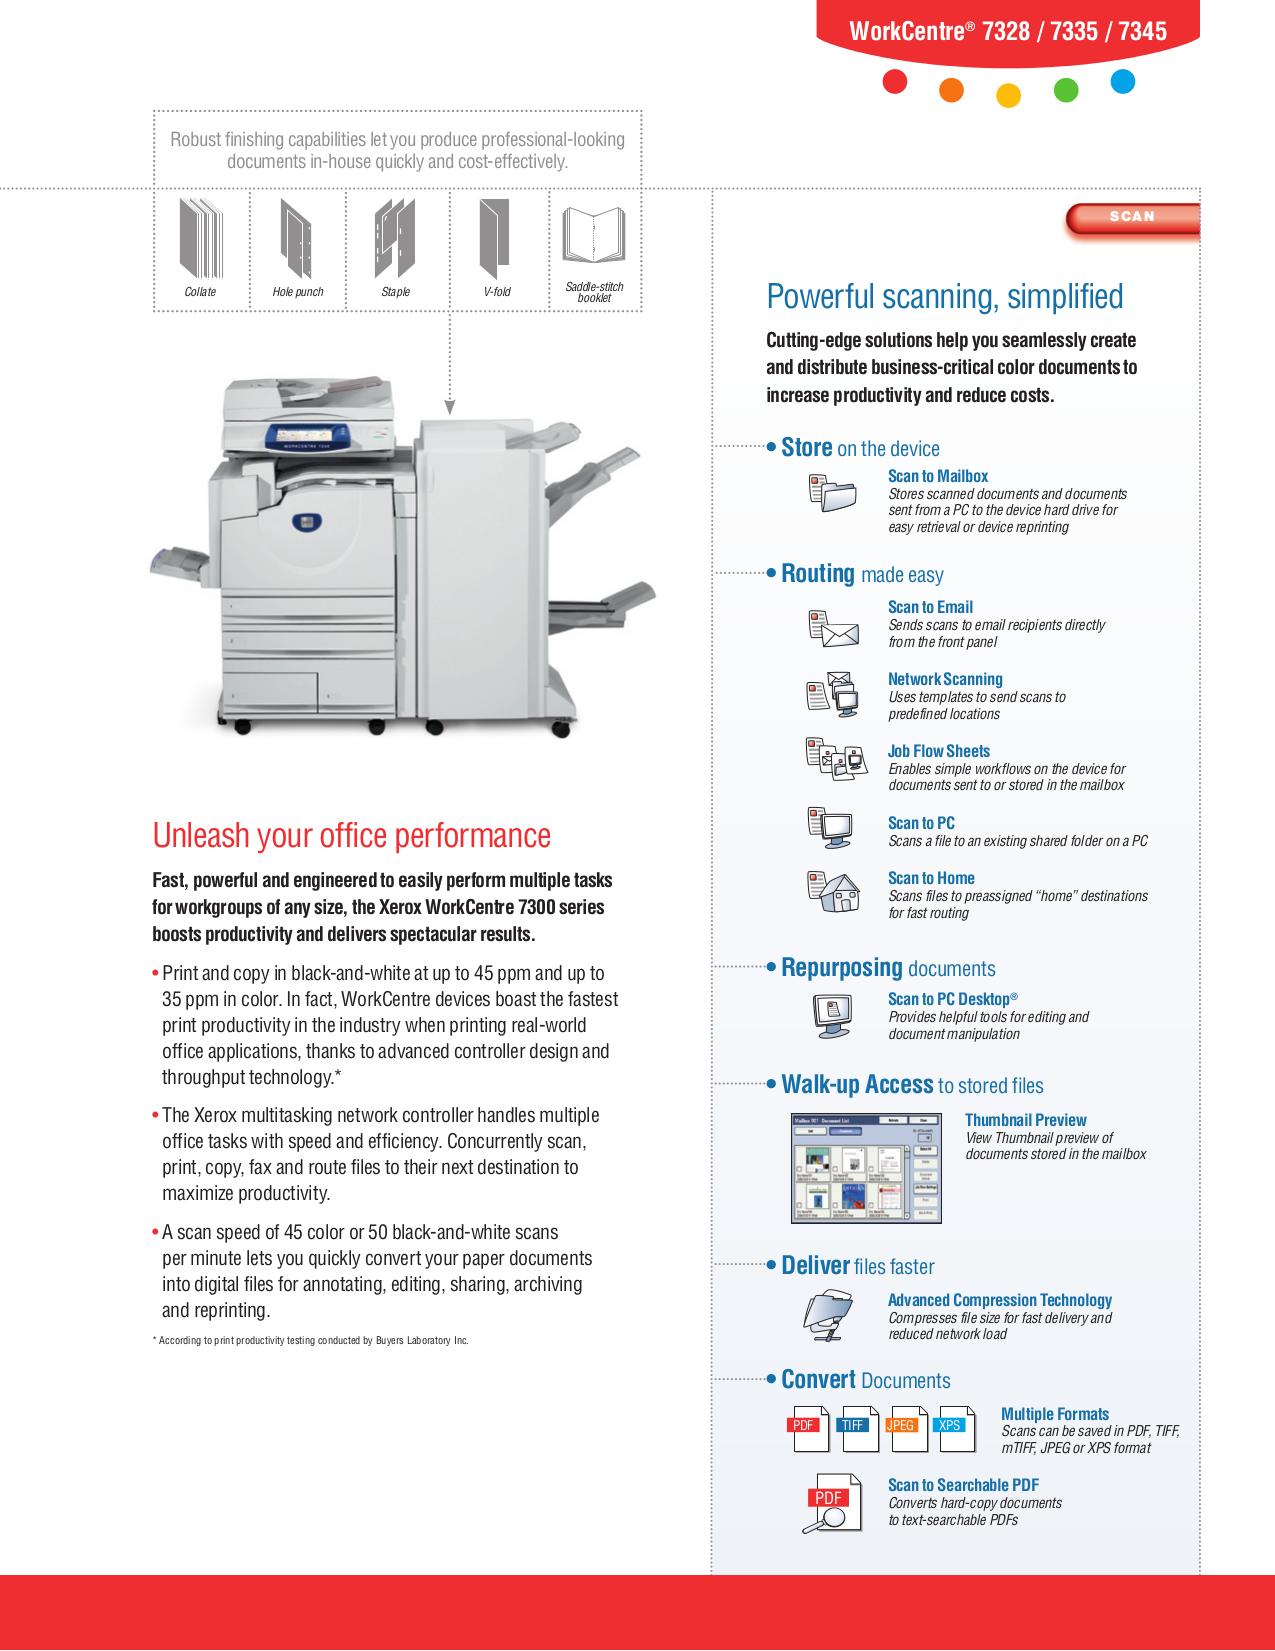 pdf manual for xerox multifunction printer workcentre 7345 rh umlib com xerox 7345 manual pdf xerox workcentre 7345 manual